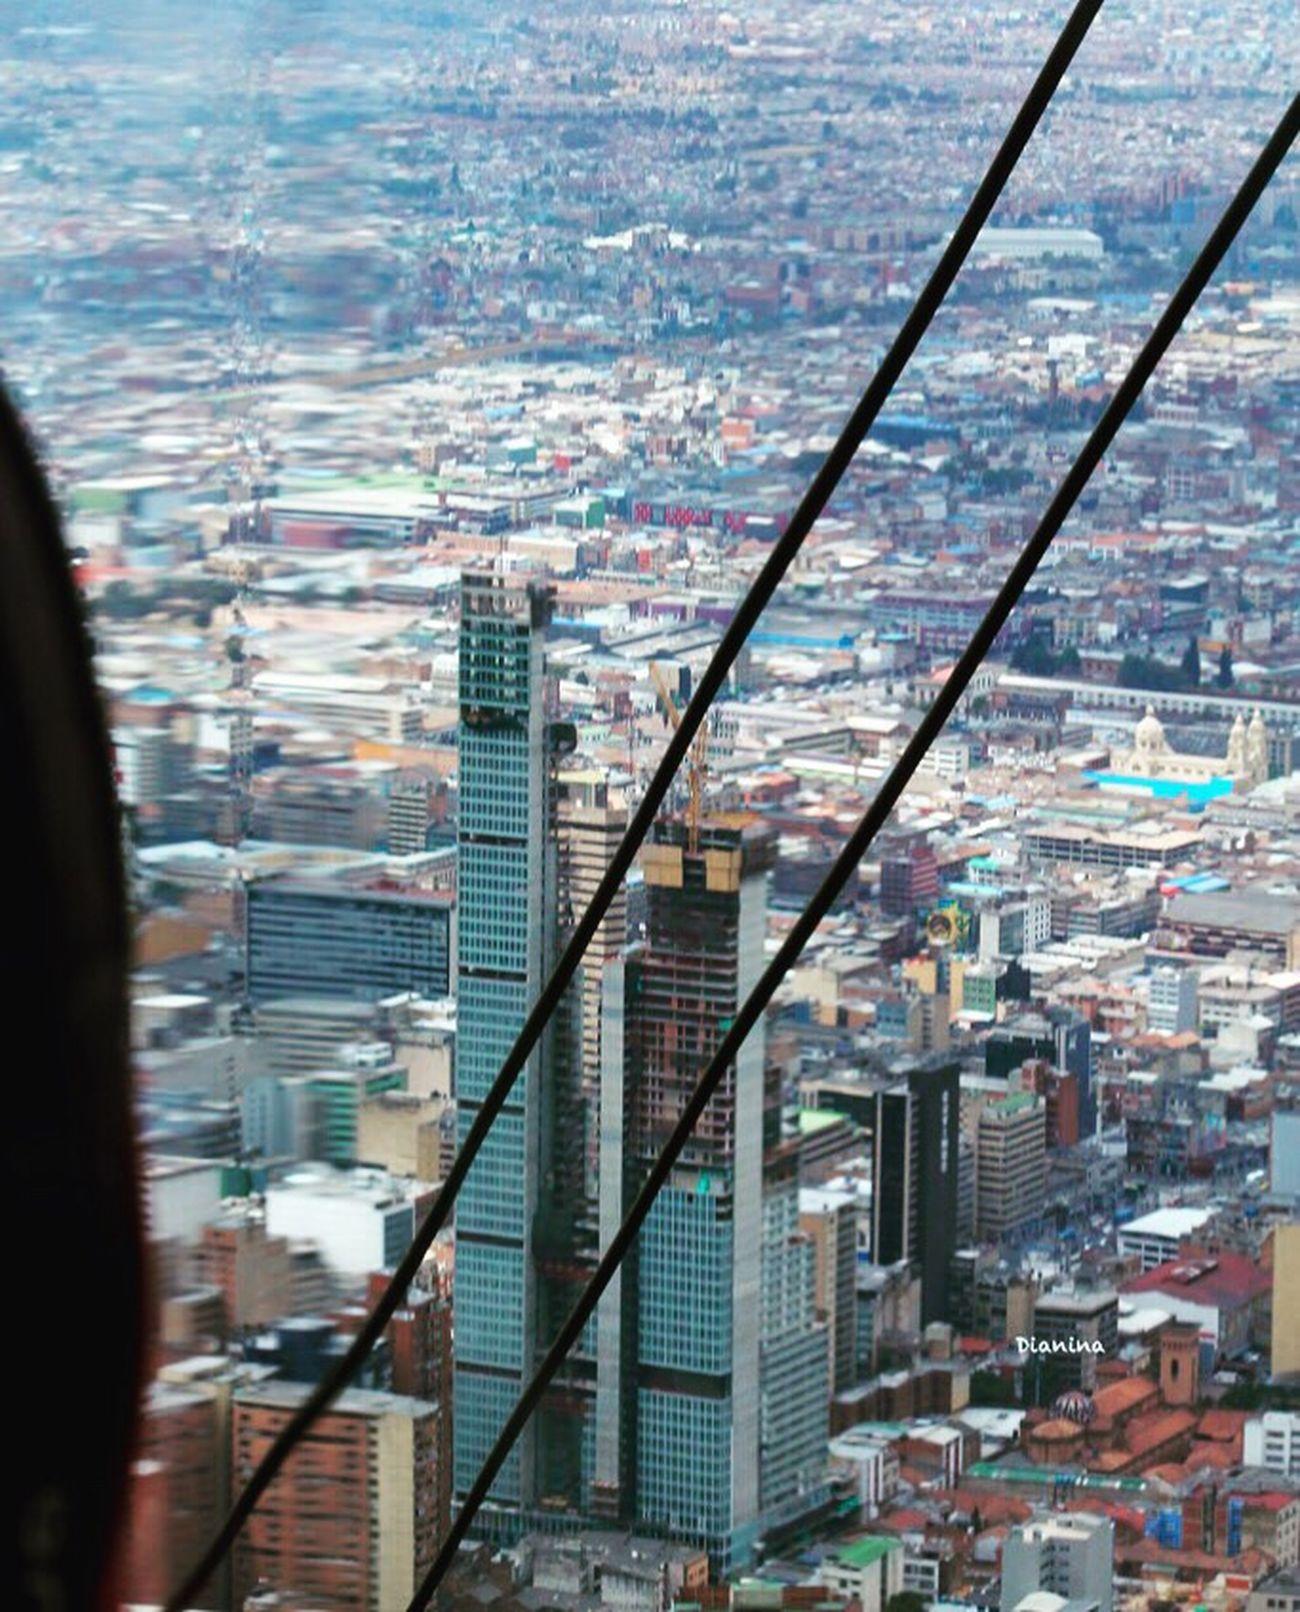 Amo a Bogotá! ❤️ ILoveBogota Taking Photos Cielito Lindo❤ Una Perspectiva Diferente NoEditNoFilter I❤️Bogotá Hello World Colombiana AmoserdeColombia Colombia ♥  SoyBogotana